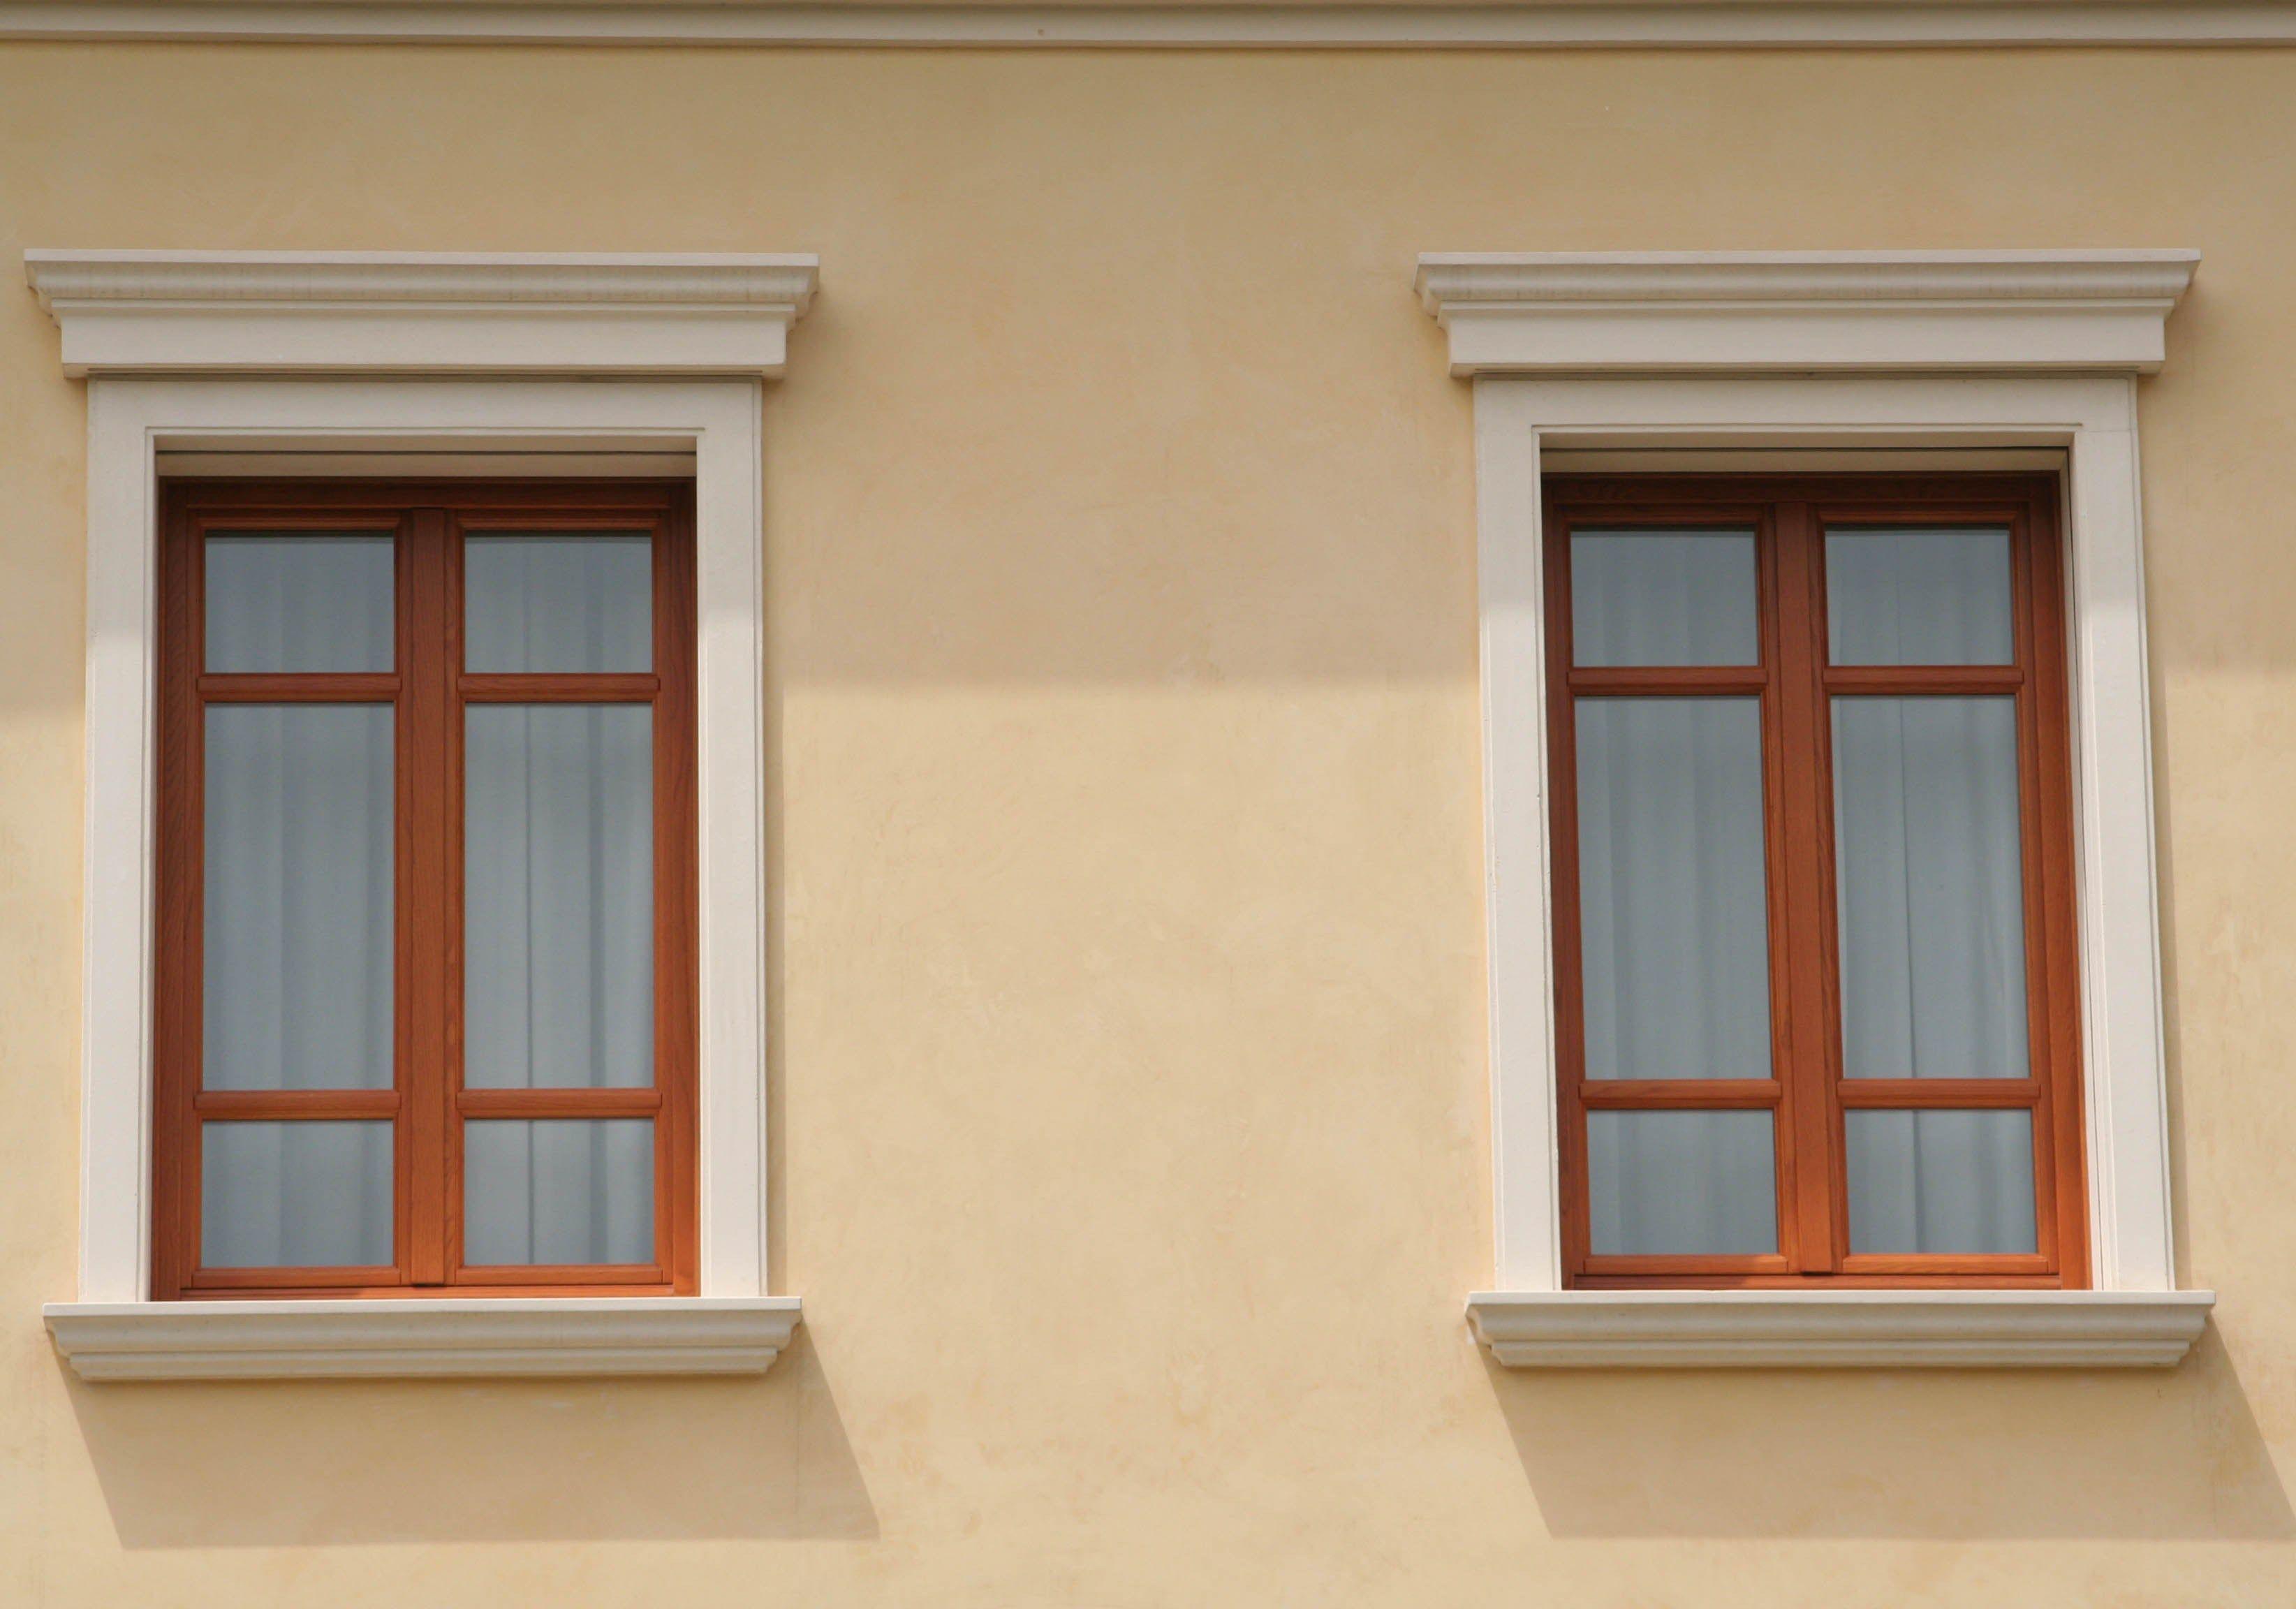 Cornici x finestre esterne - Decori per finestre esterne ...